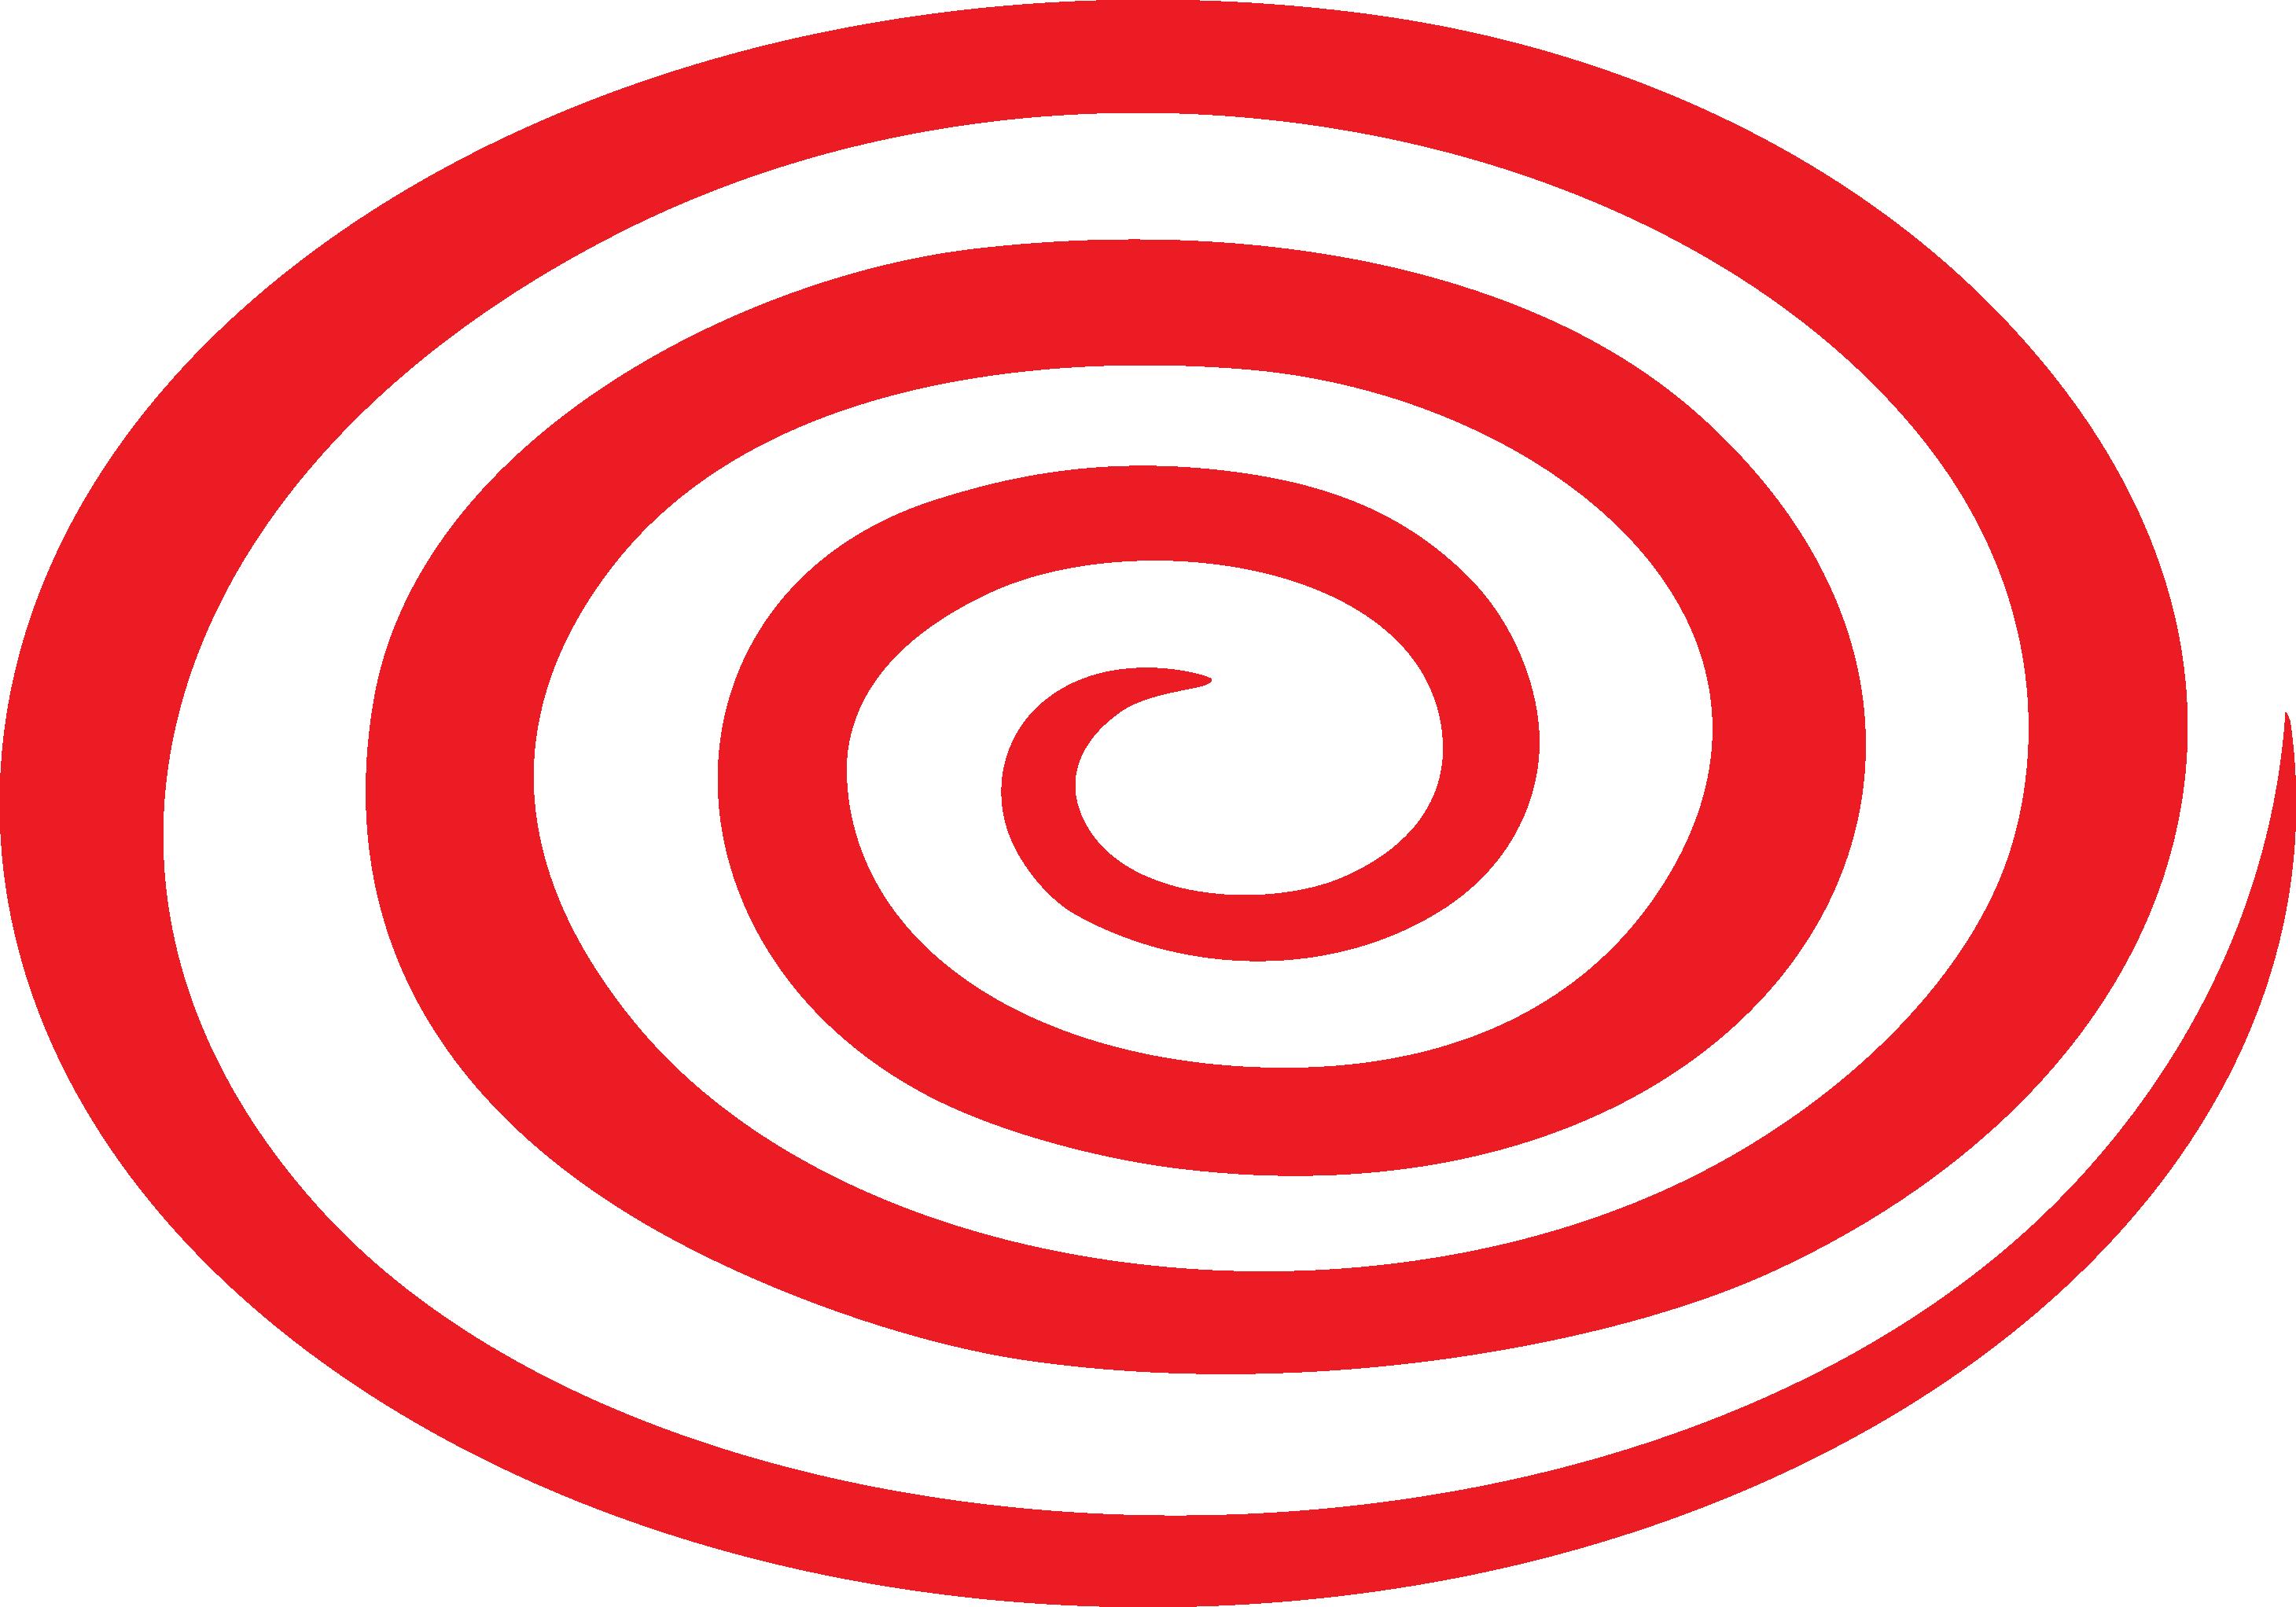 Twirl photo